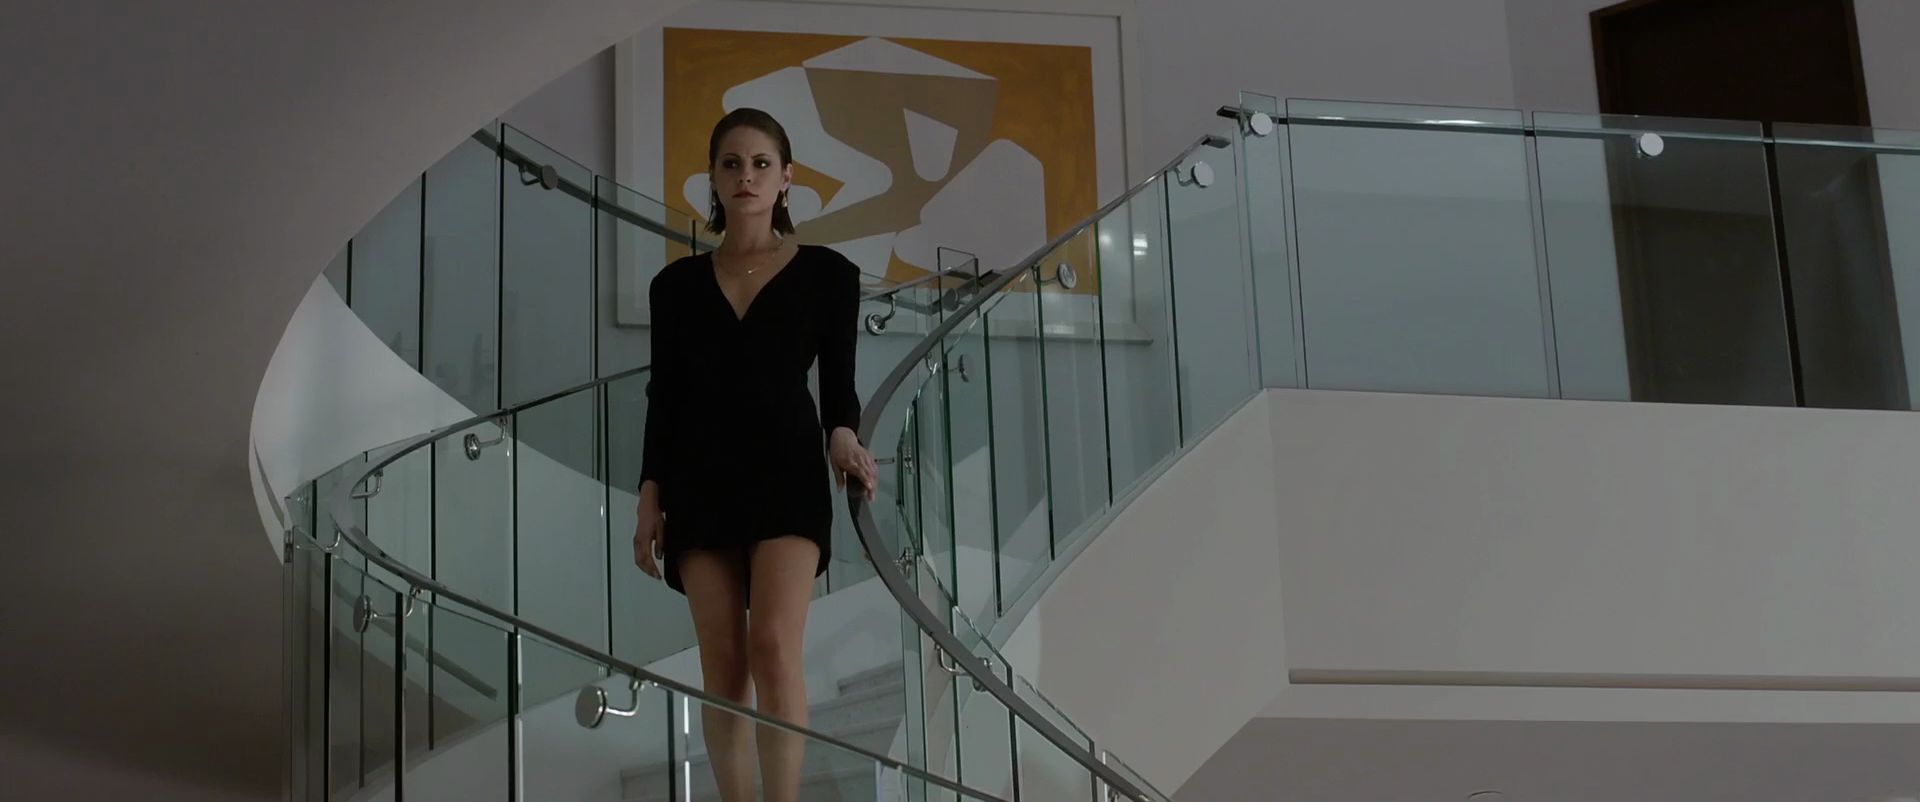 Yvonne strahovski nude scene in louie scandalplanetcom - 3 part 6